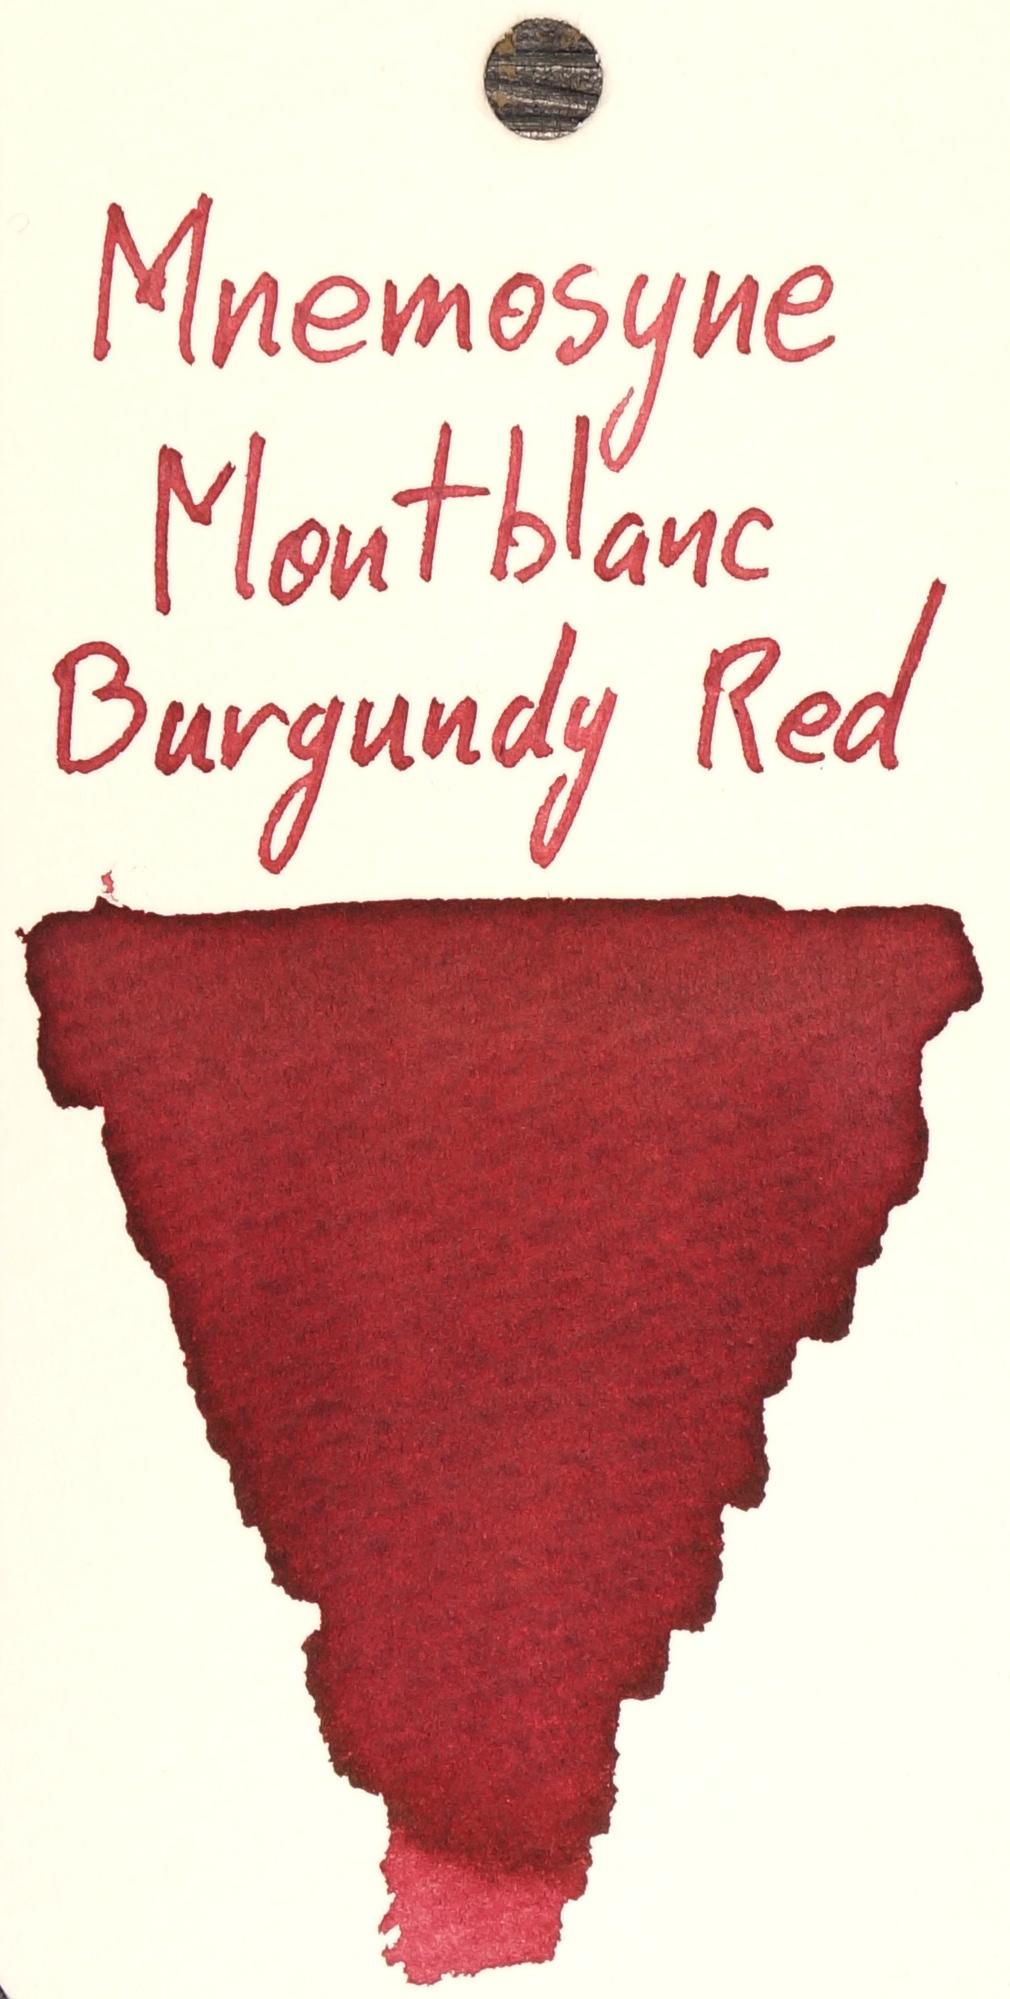 Montblanc Burgundy Red Mnemosyne.JPG